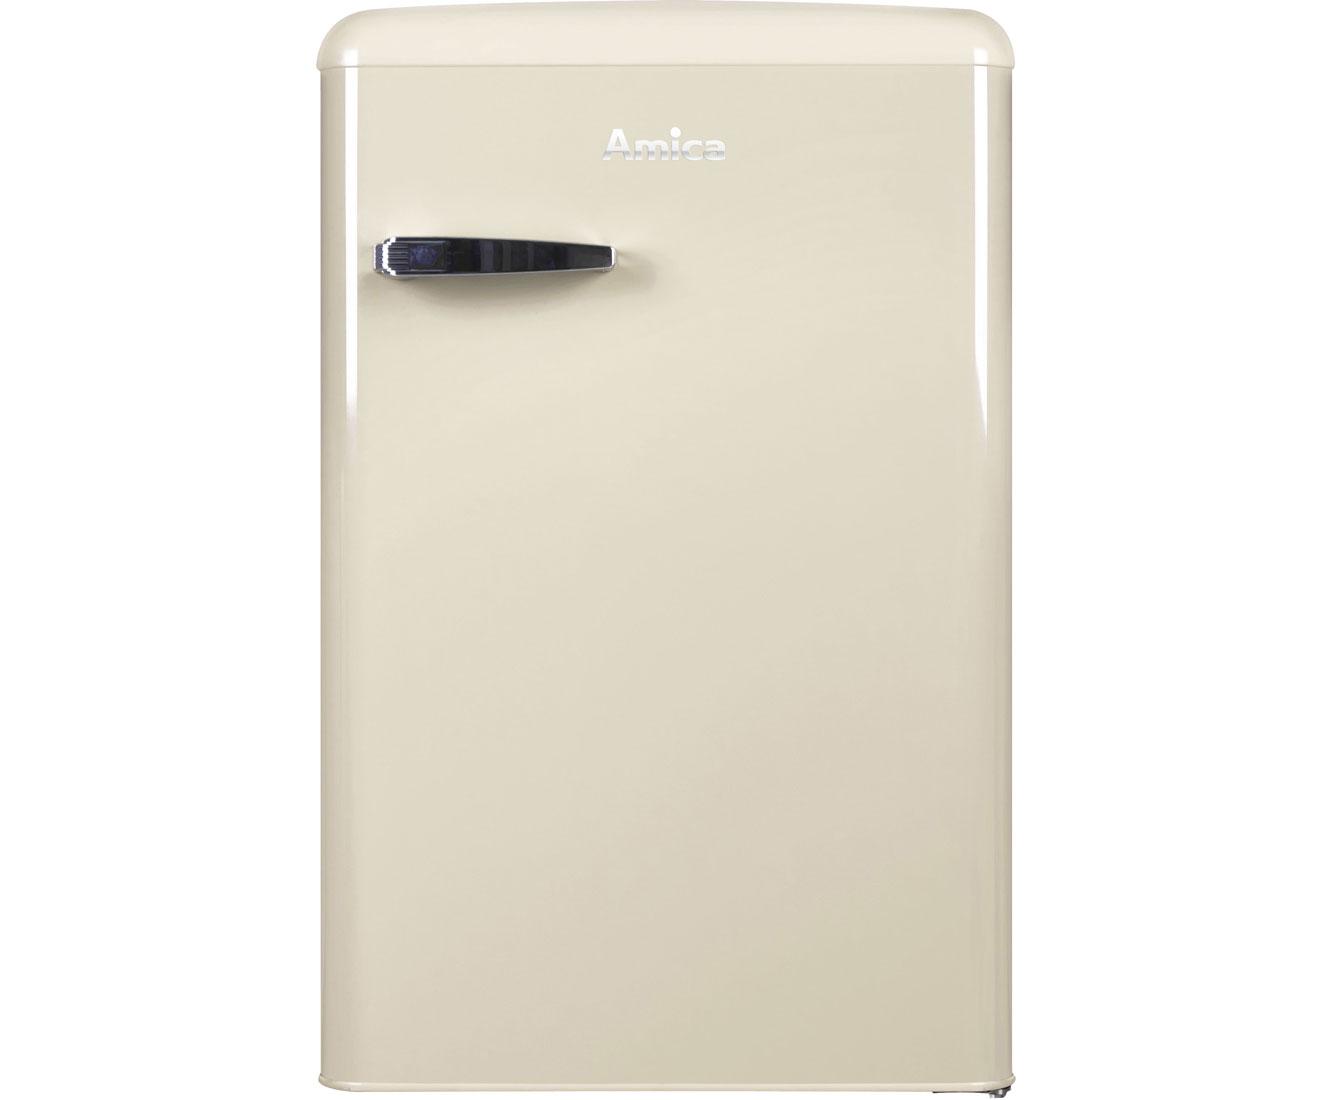 Amica Retro Kühlschrank Test : Amica kühlschrank retro bewertung: amica ks b beige mediamarkt. de